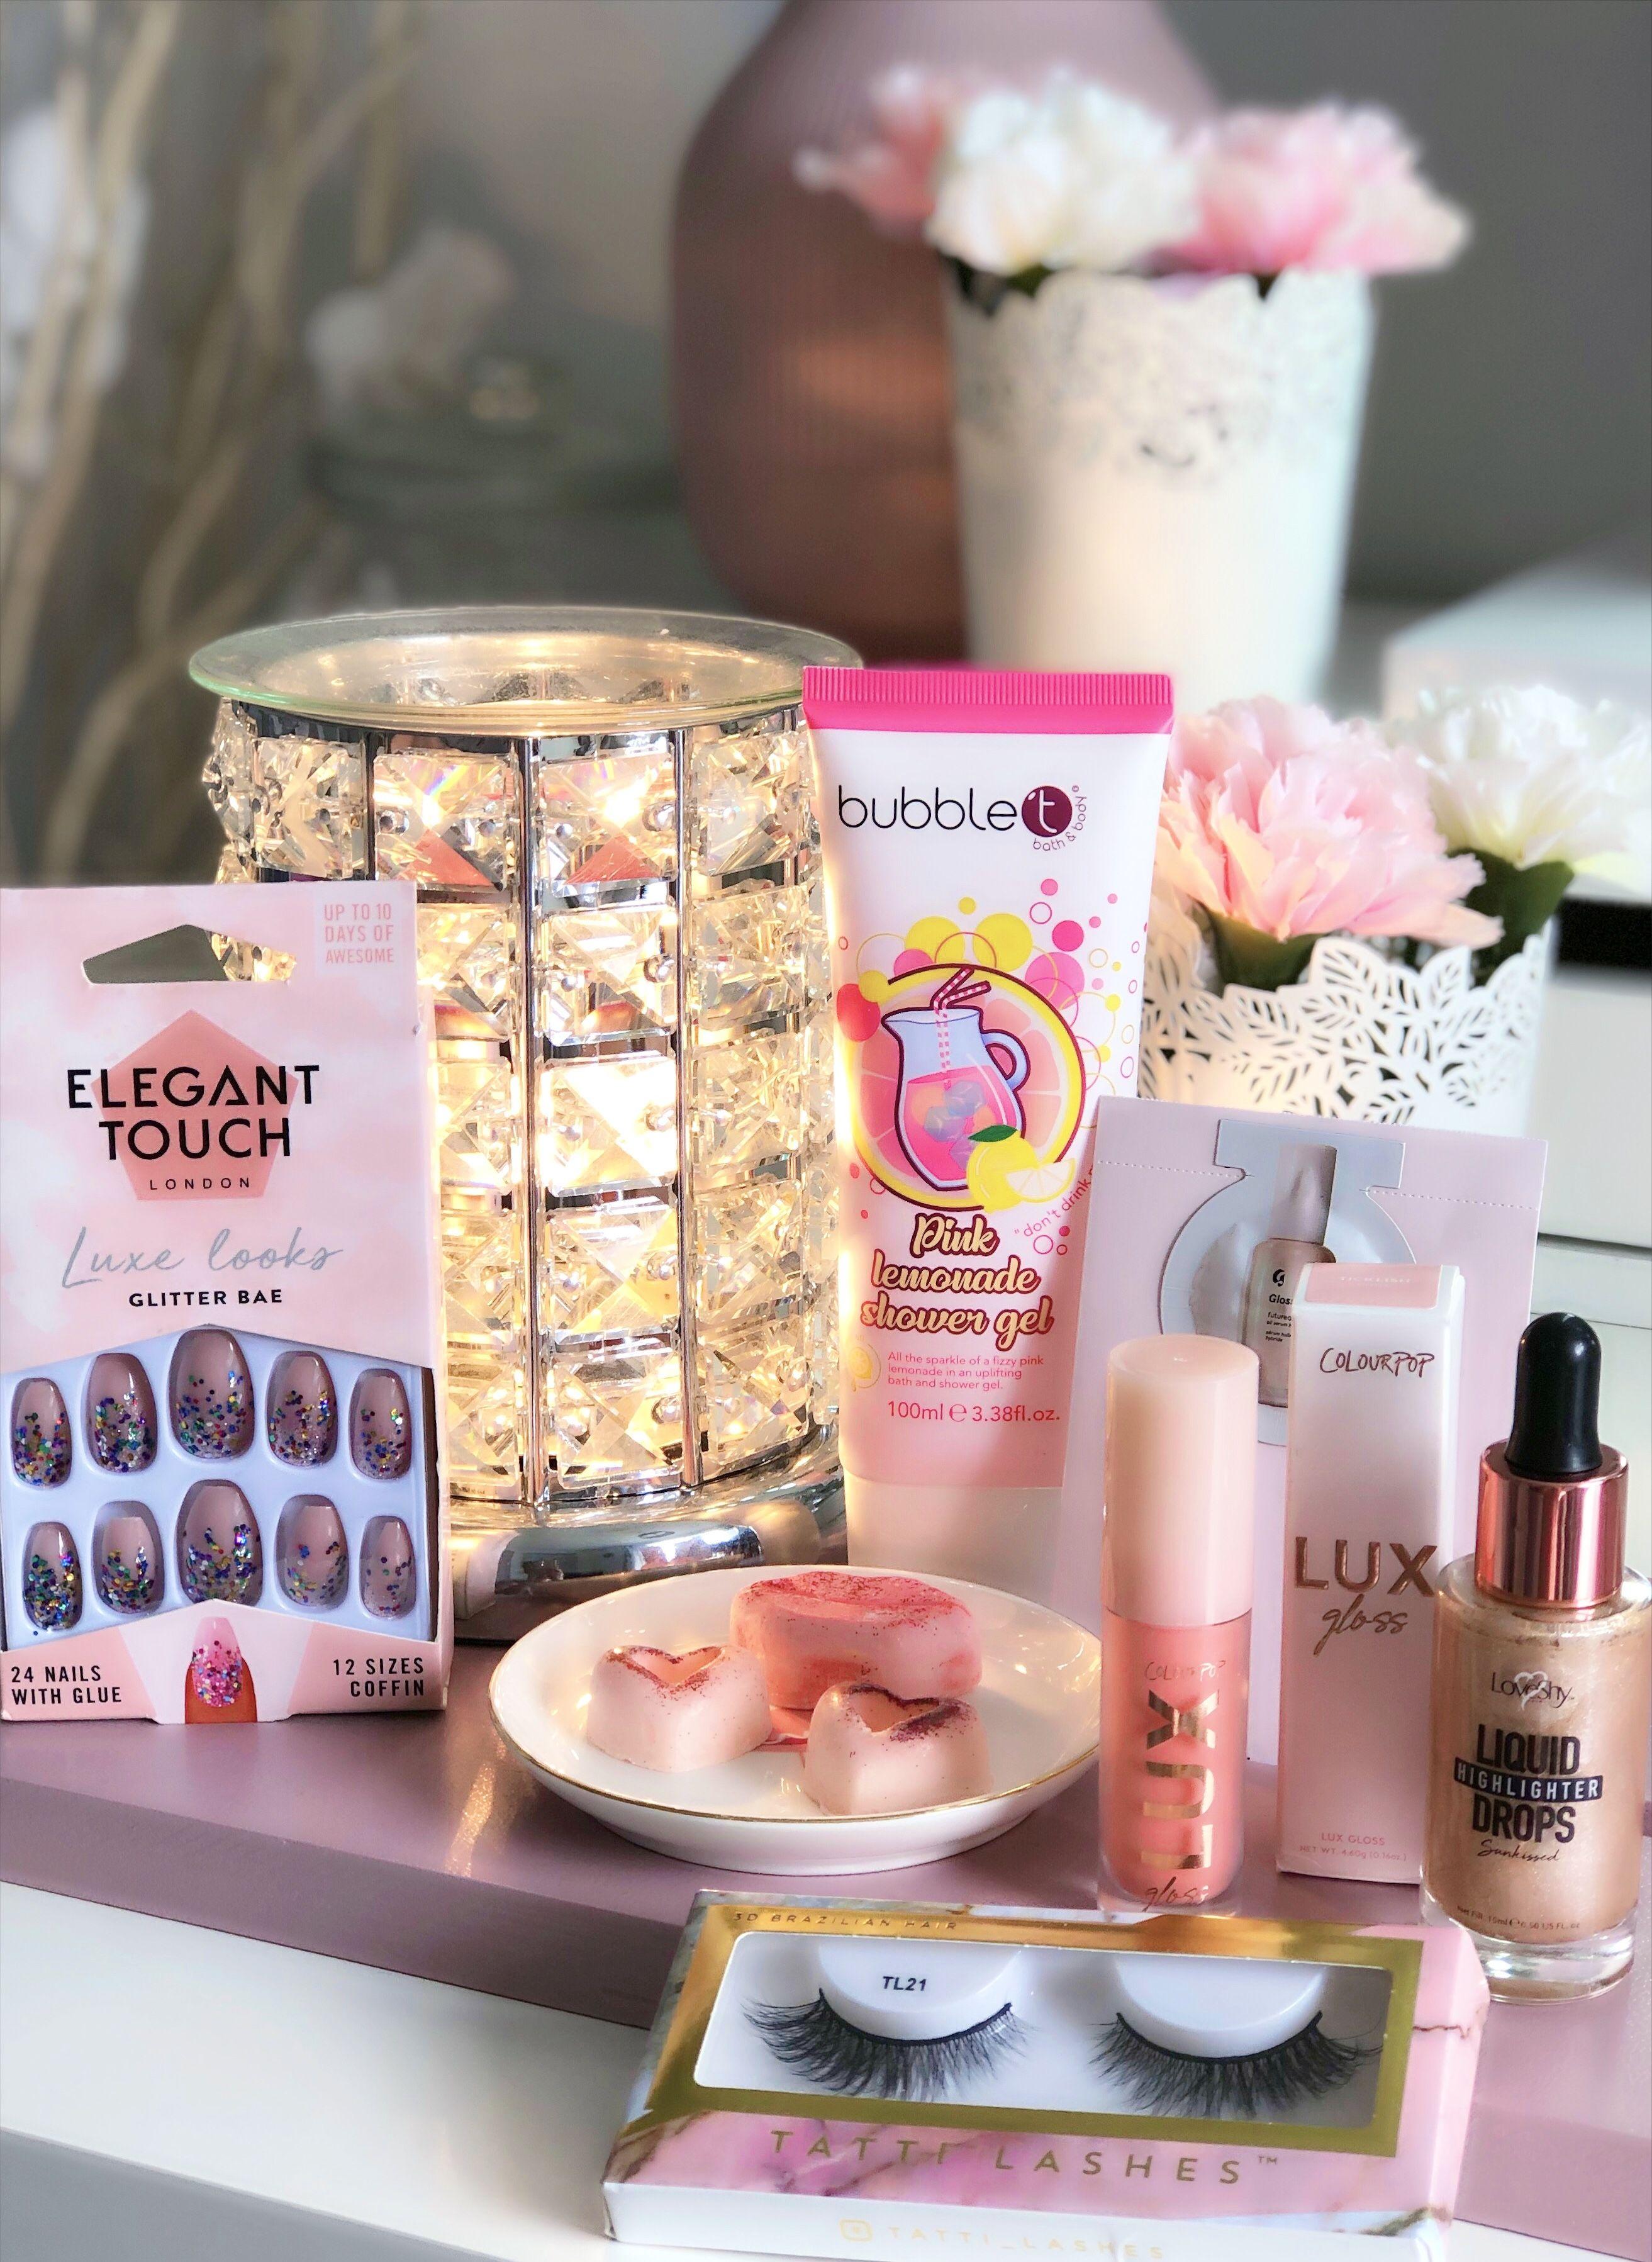 Beauty Mystery Box in 2020 Beauty blog, Colourpop